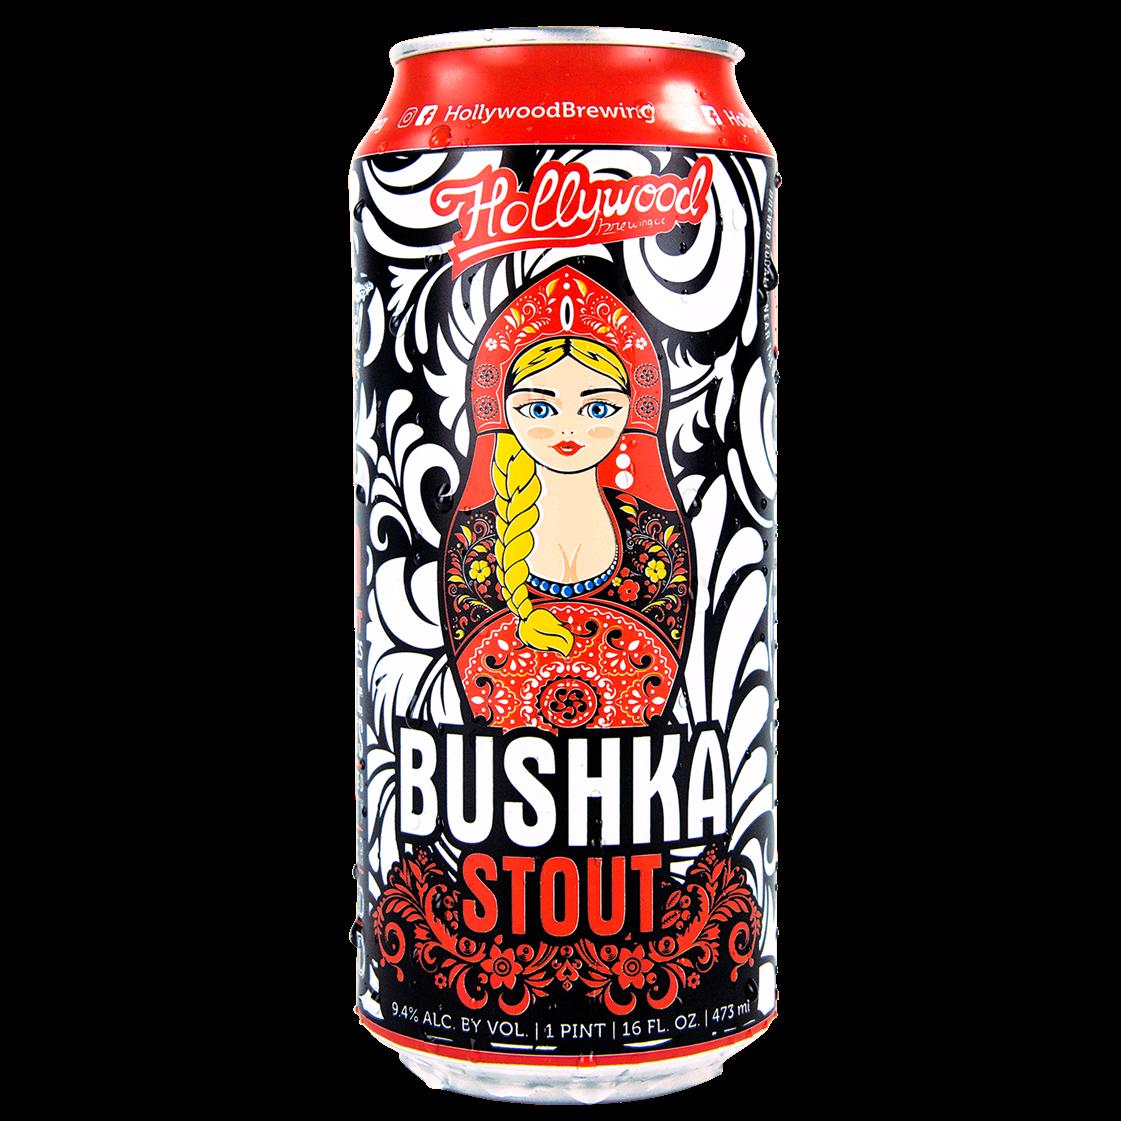 Bushka Stout